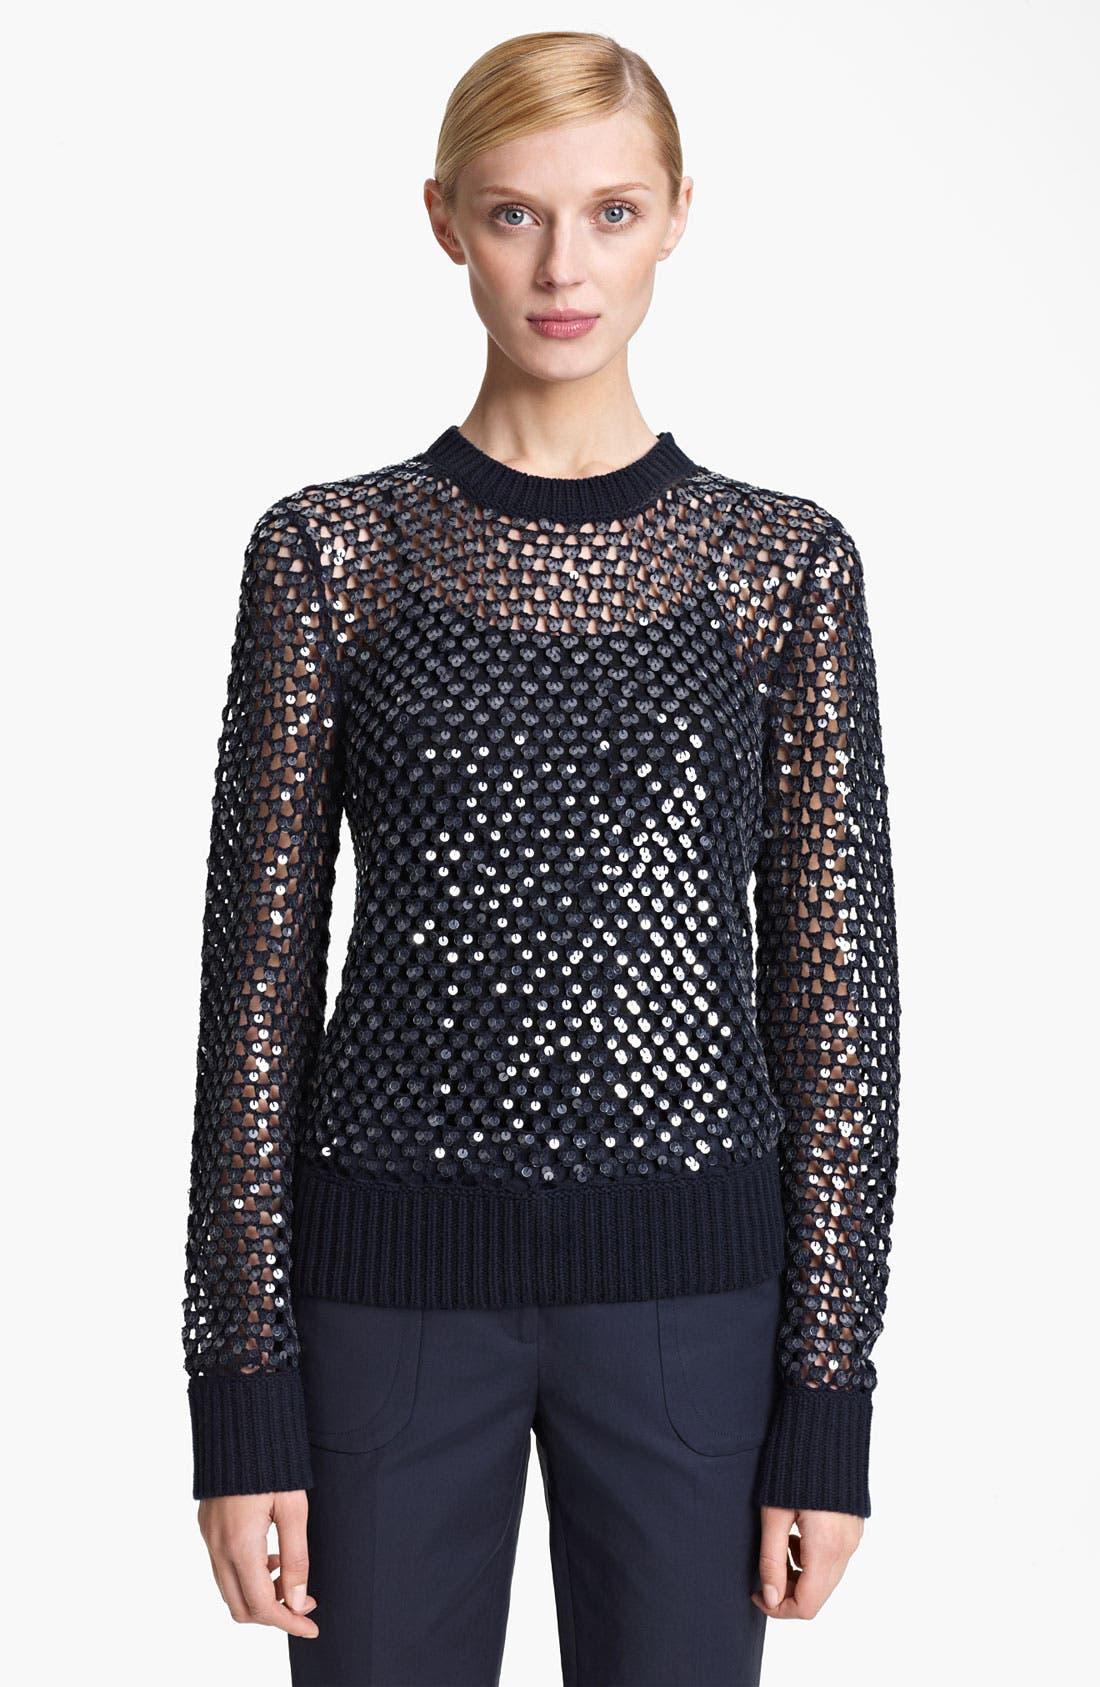 Alternate Image 1 Selected - Michael Kors Paillette Cashmere Sweater